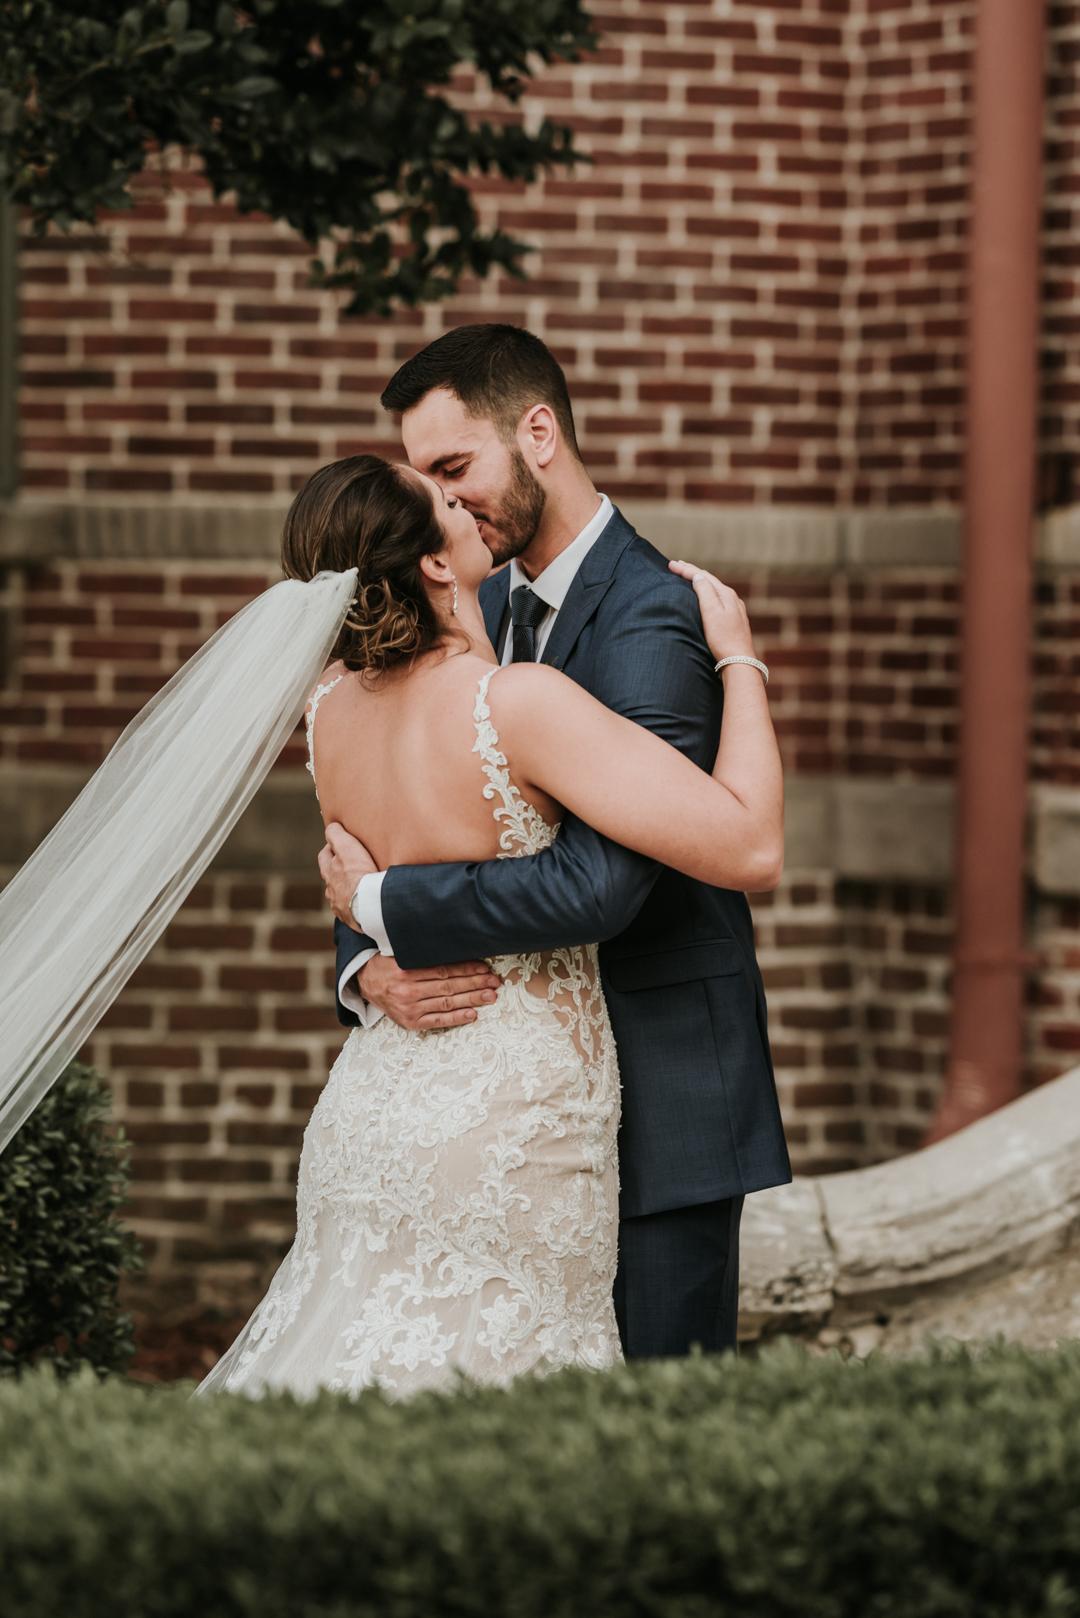 cavu-tampa-wedding-charlie-lauren-32.jpg